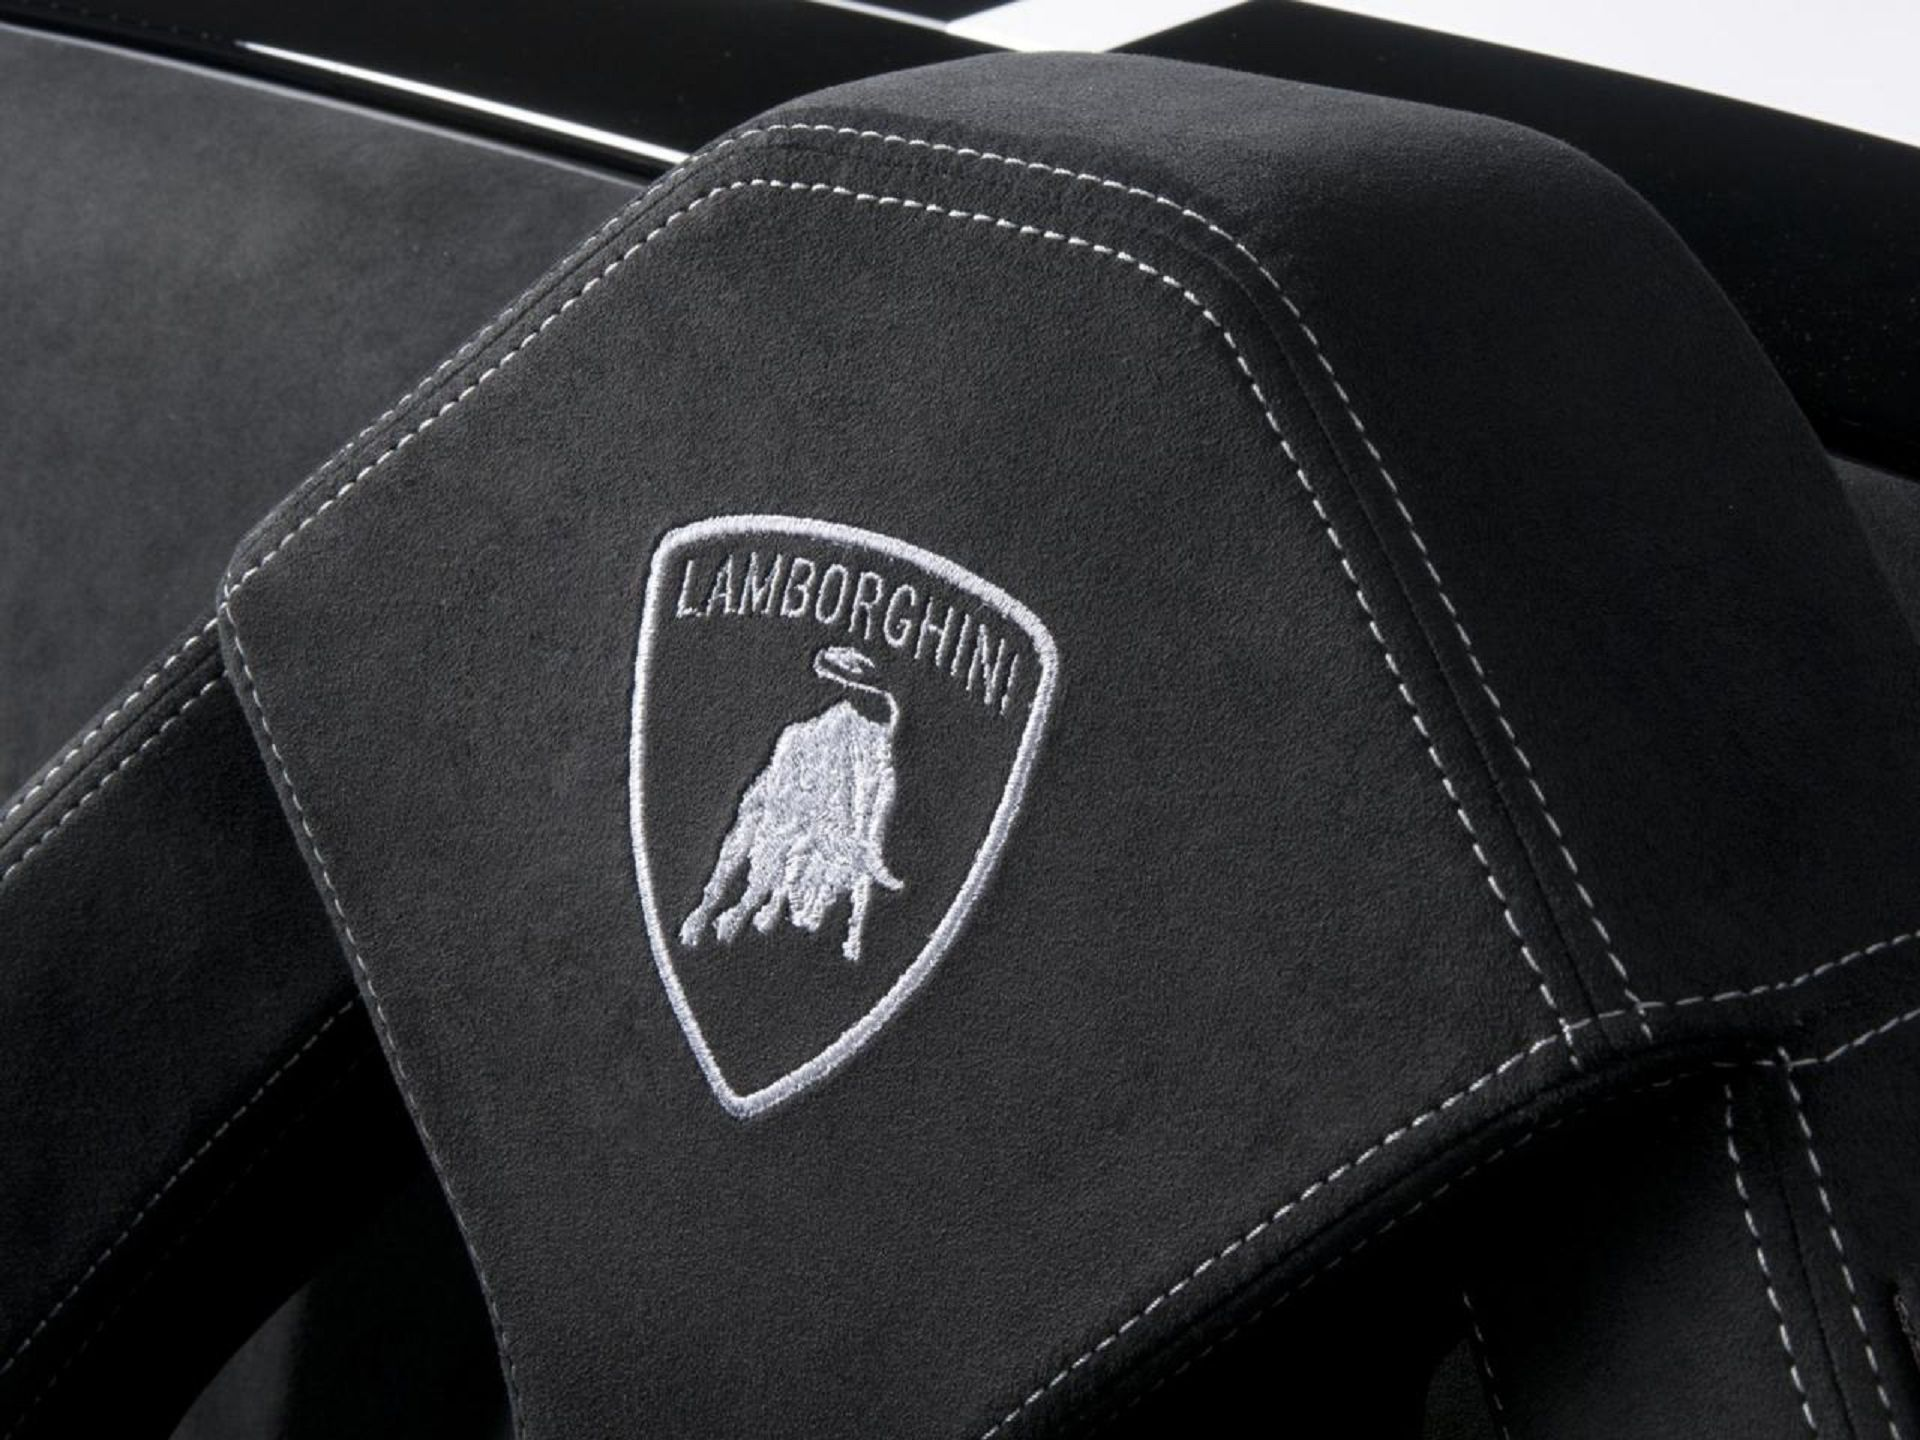 Lamborghini Logo Wallpapers Wallpaper 1920x1440